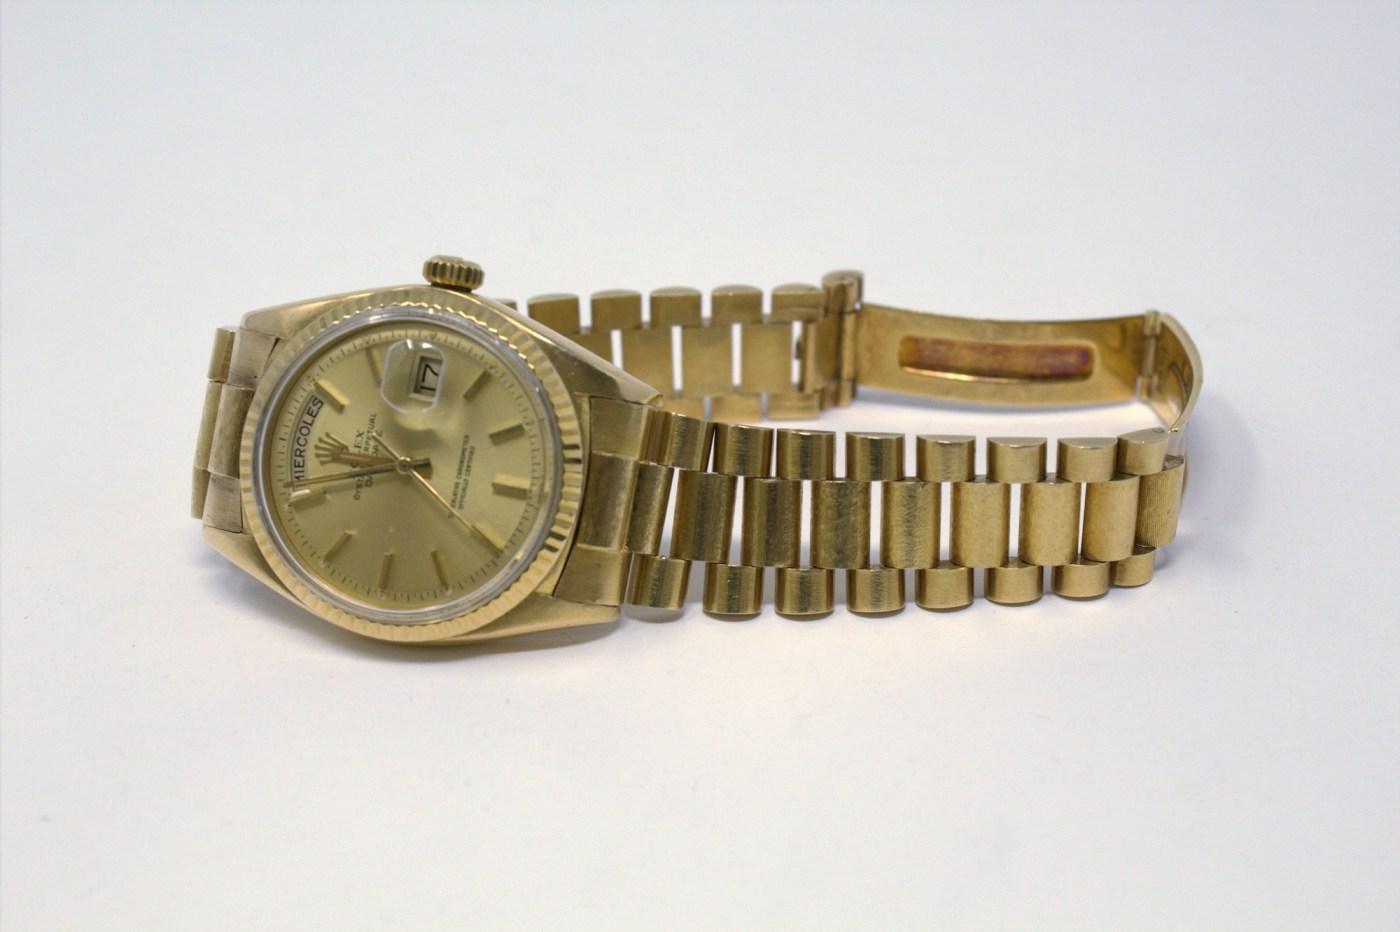 Rolex Yellow Gold Day-Date at Chronoexpert